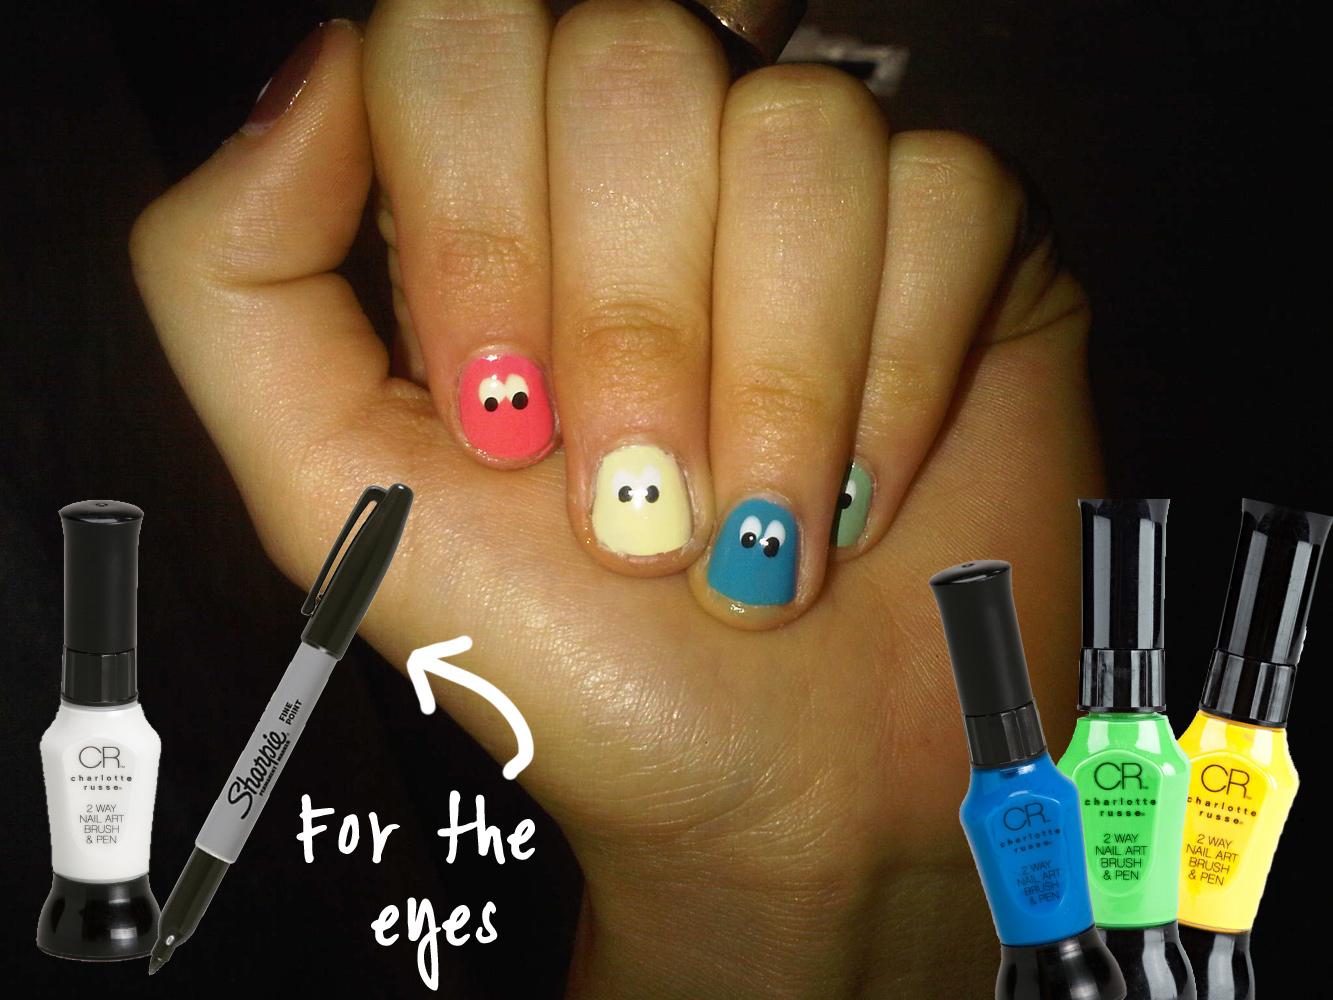 Fantastic Easy Nail Art Pen Designs 3 Image Collection - Nail Art ...